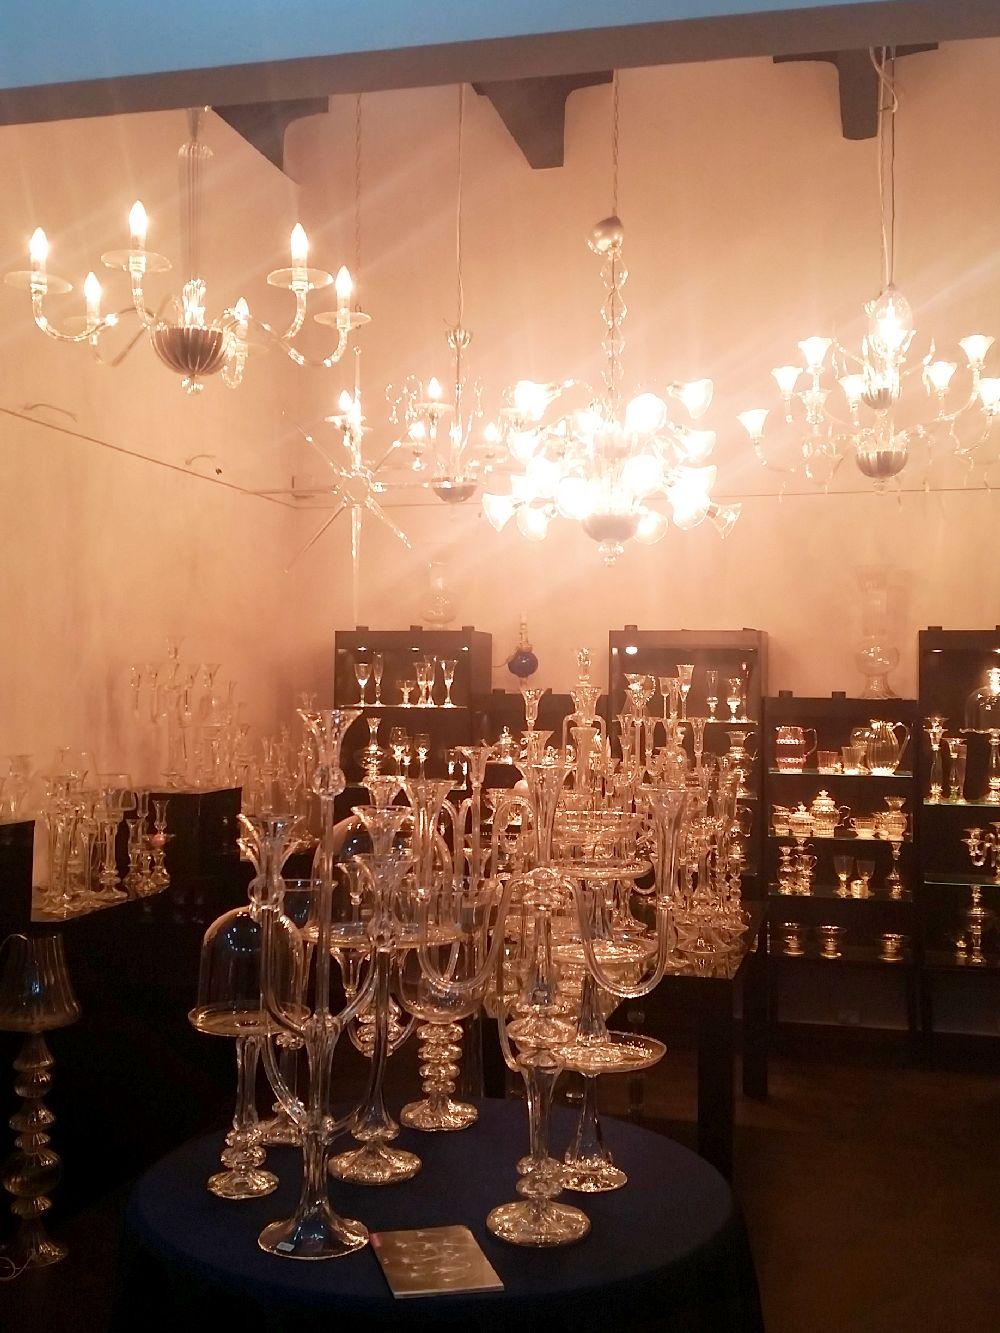 adelaparvu.com despre atelierul de sticlarie Gabriela Seres (1)